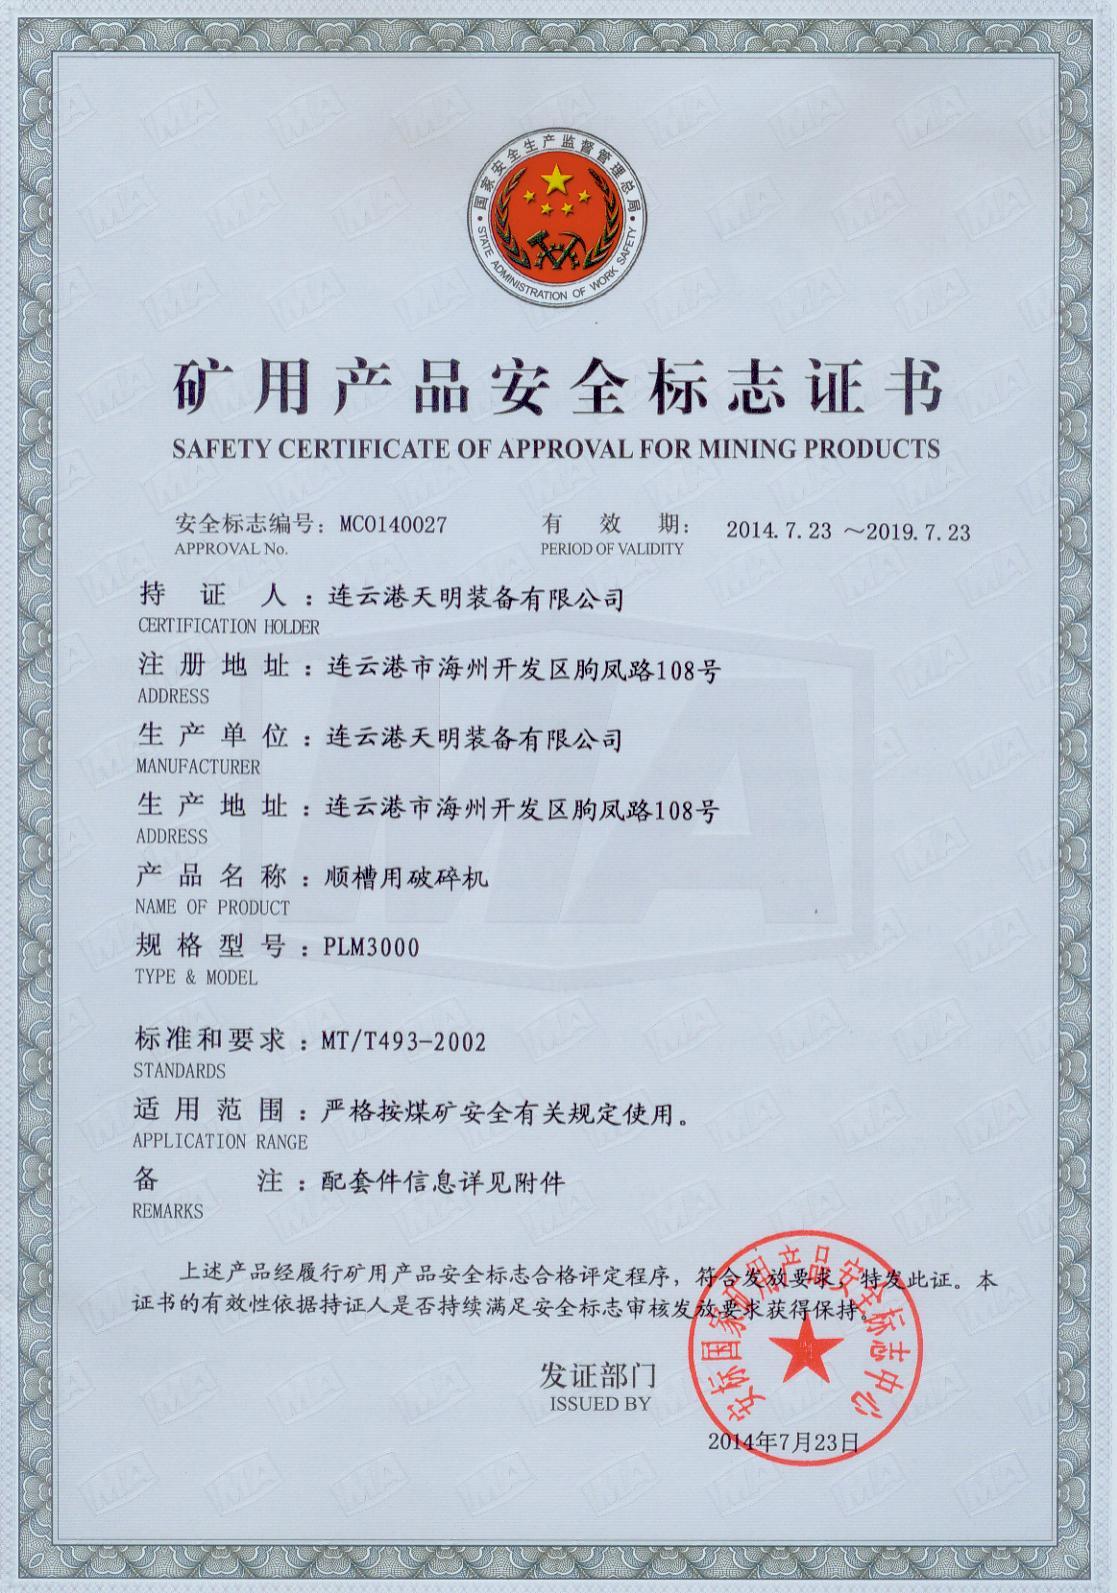 MA Certificates